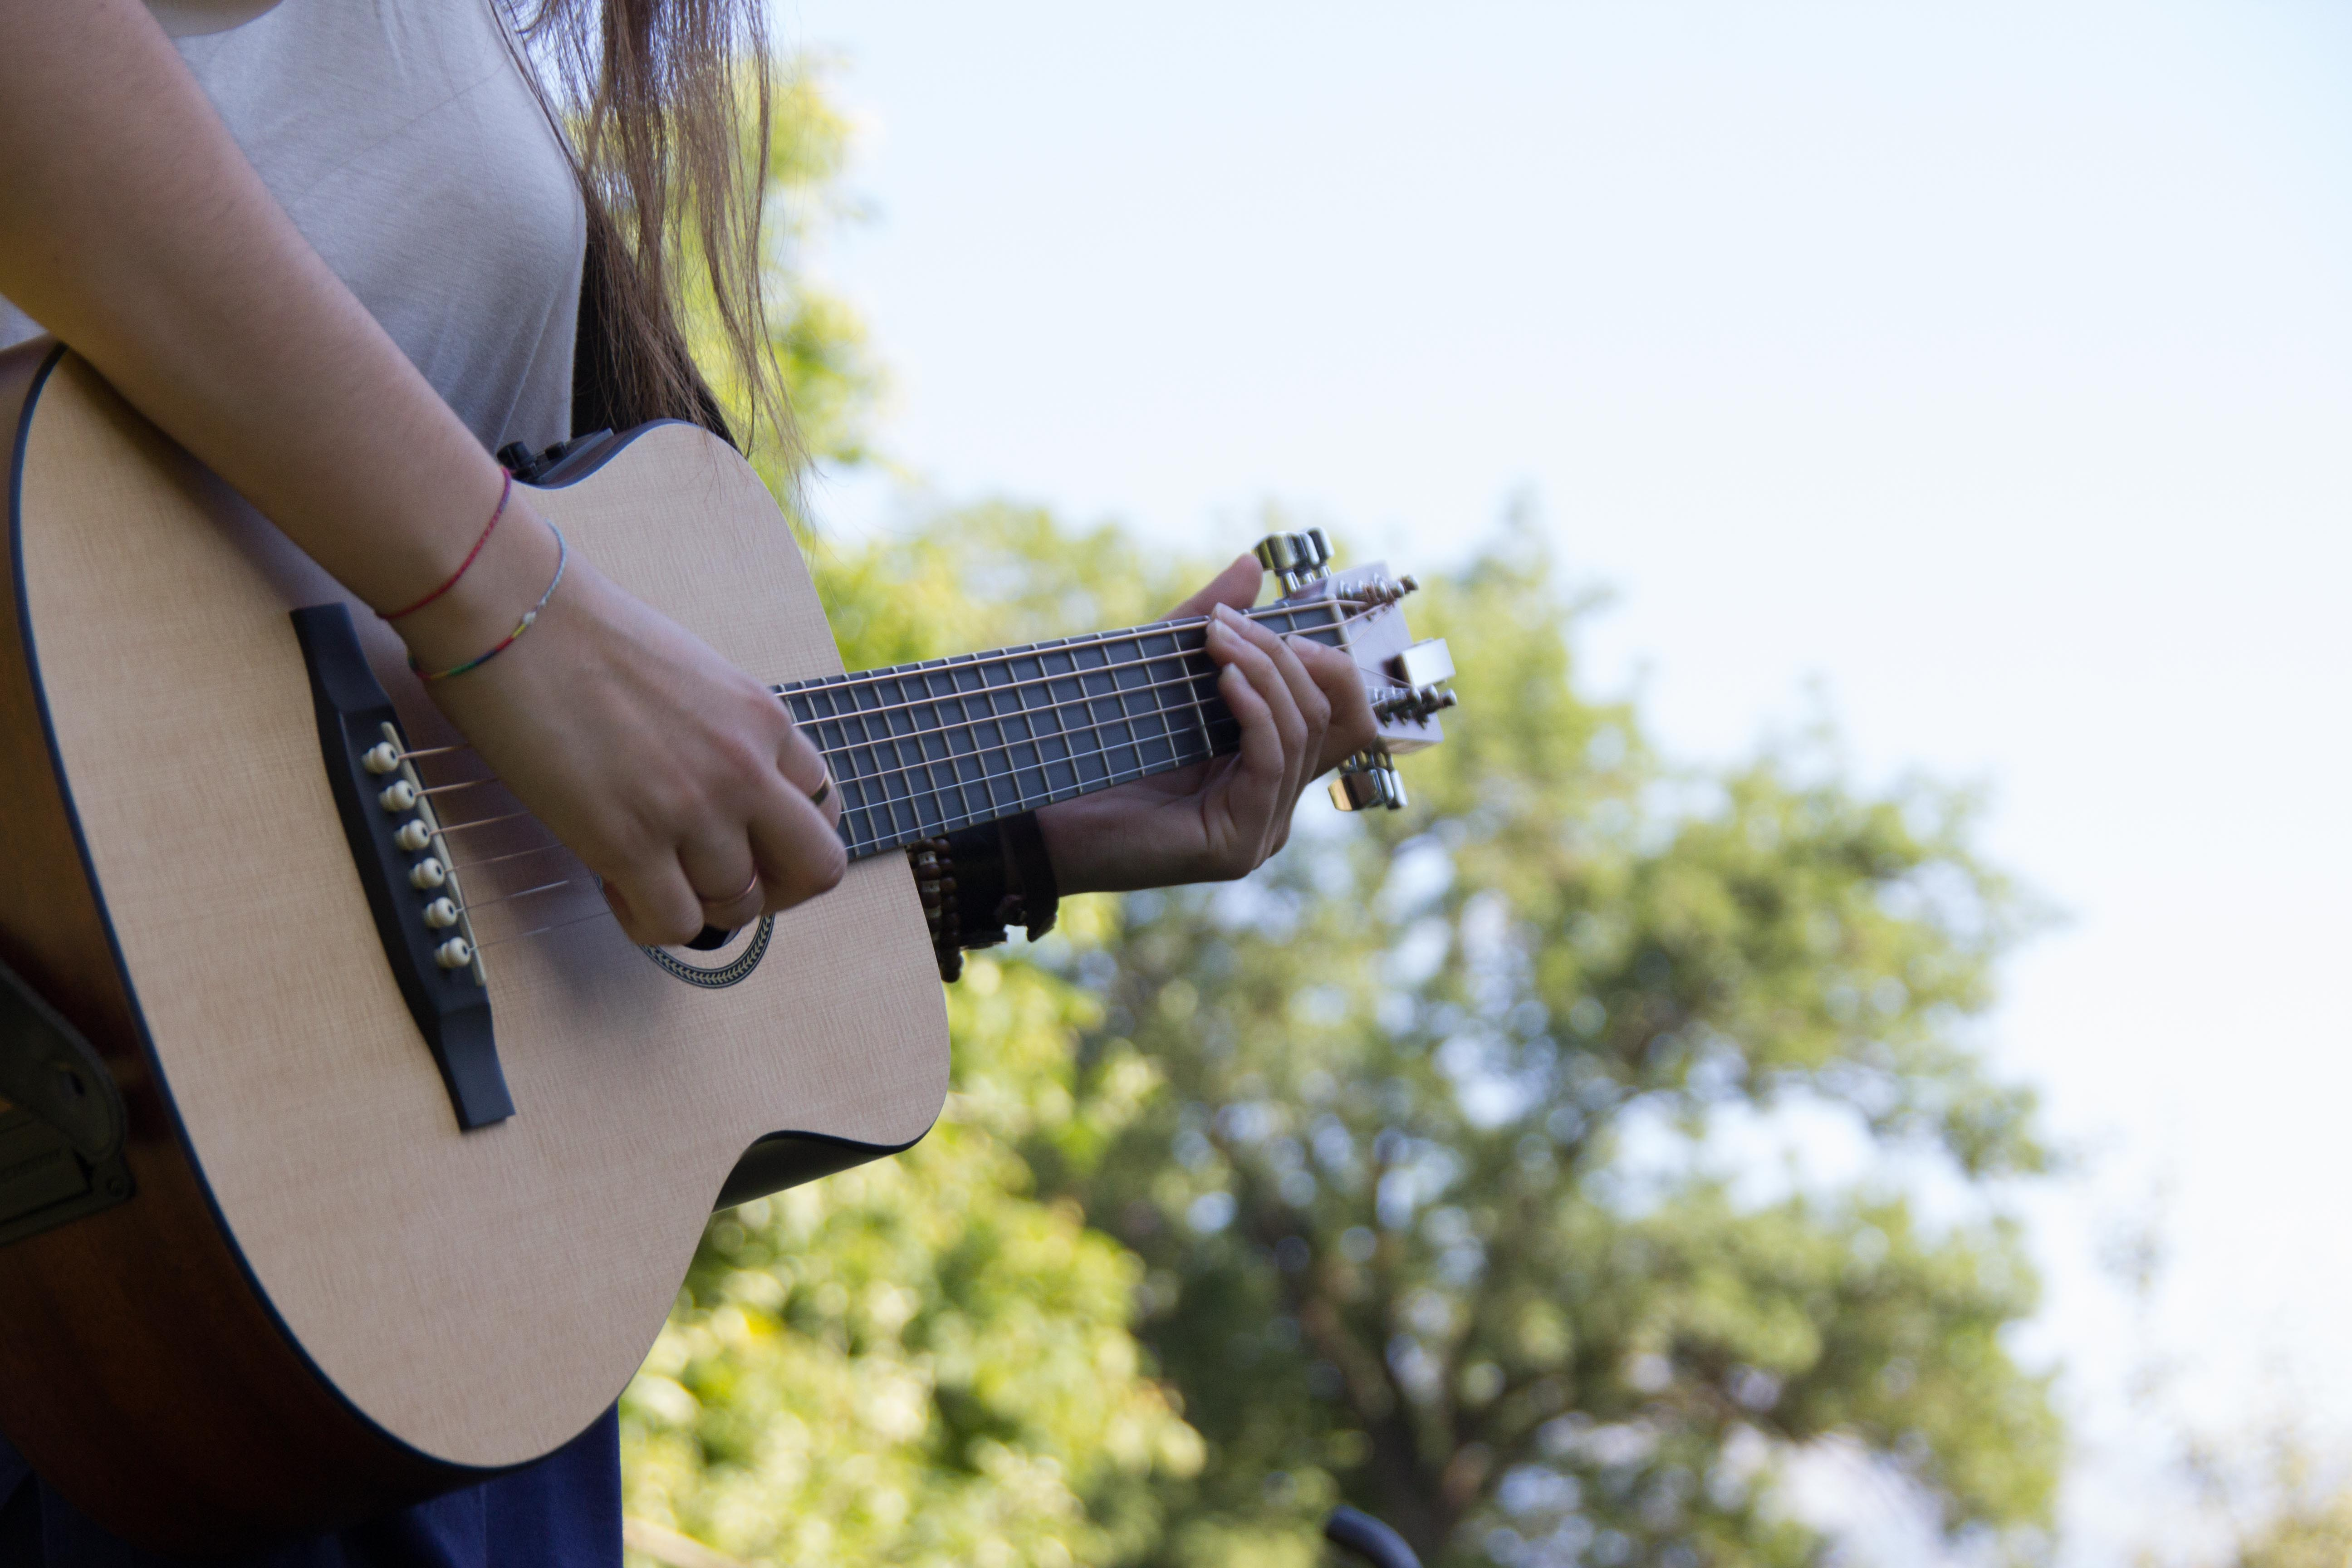 Veronica Fusaros Gitarre. Bild: Elias Rüegsegger